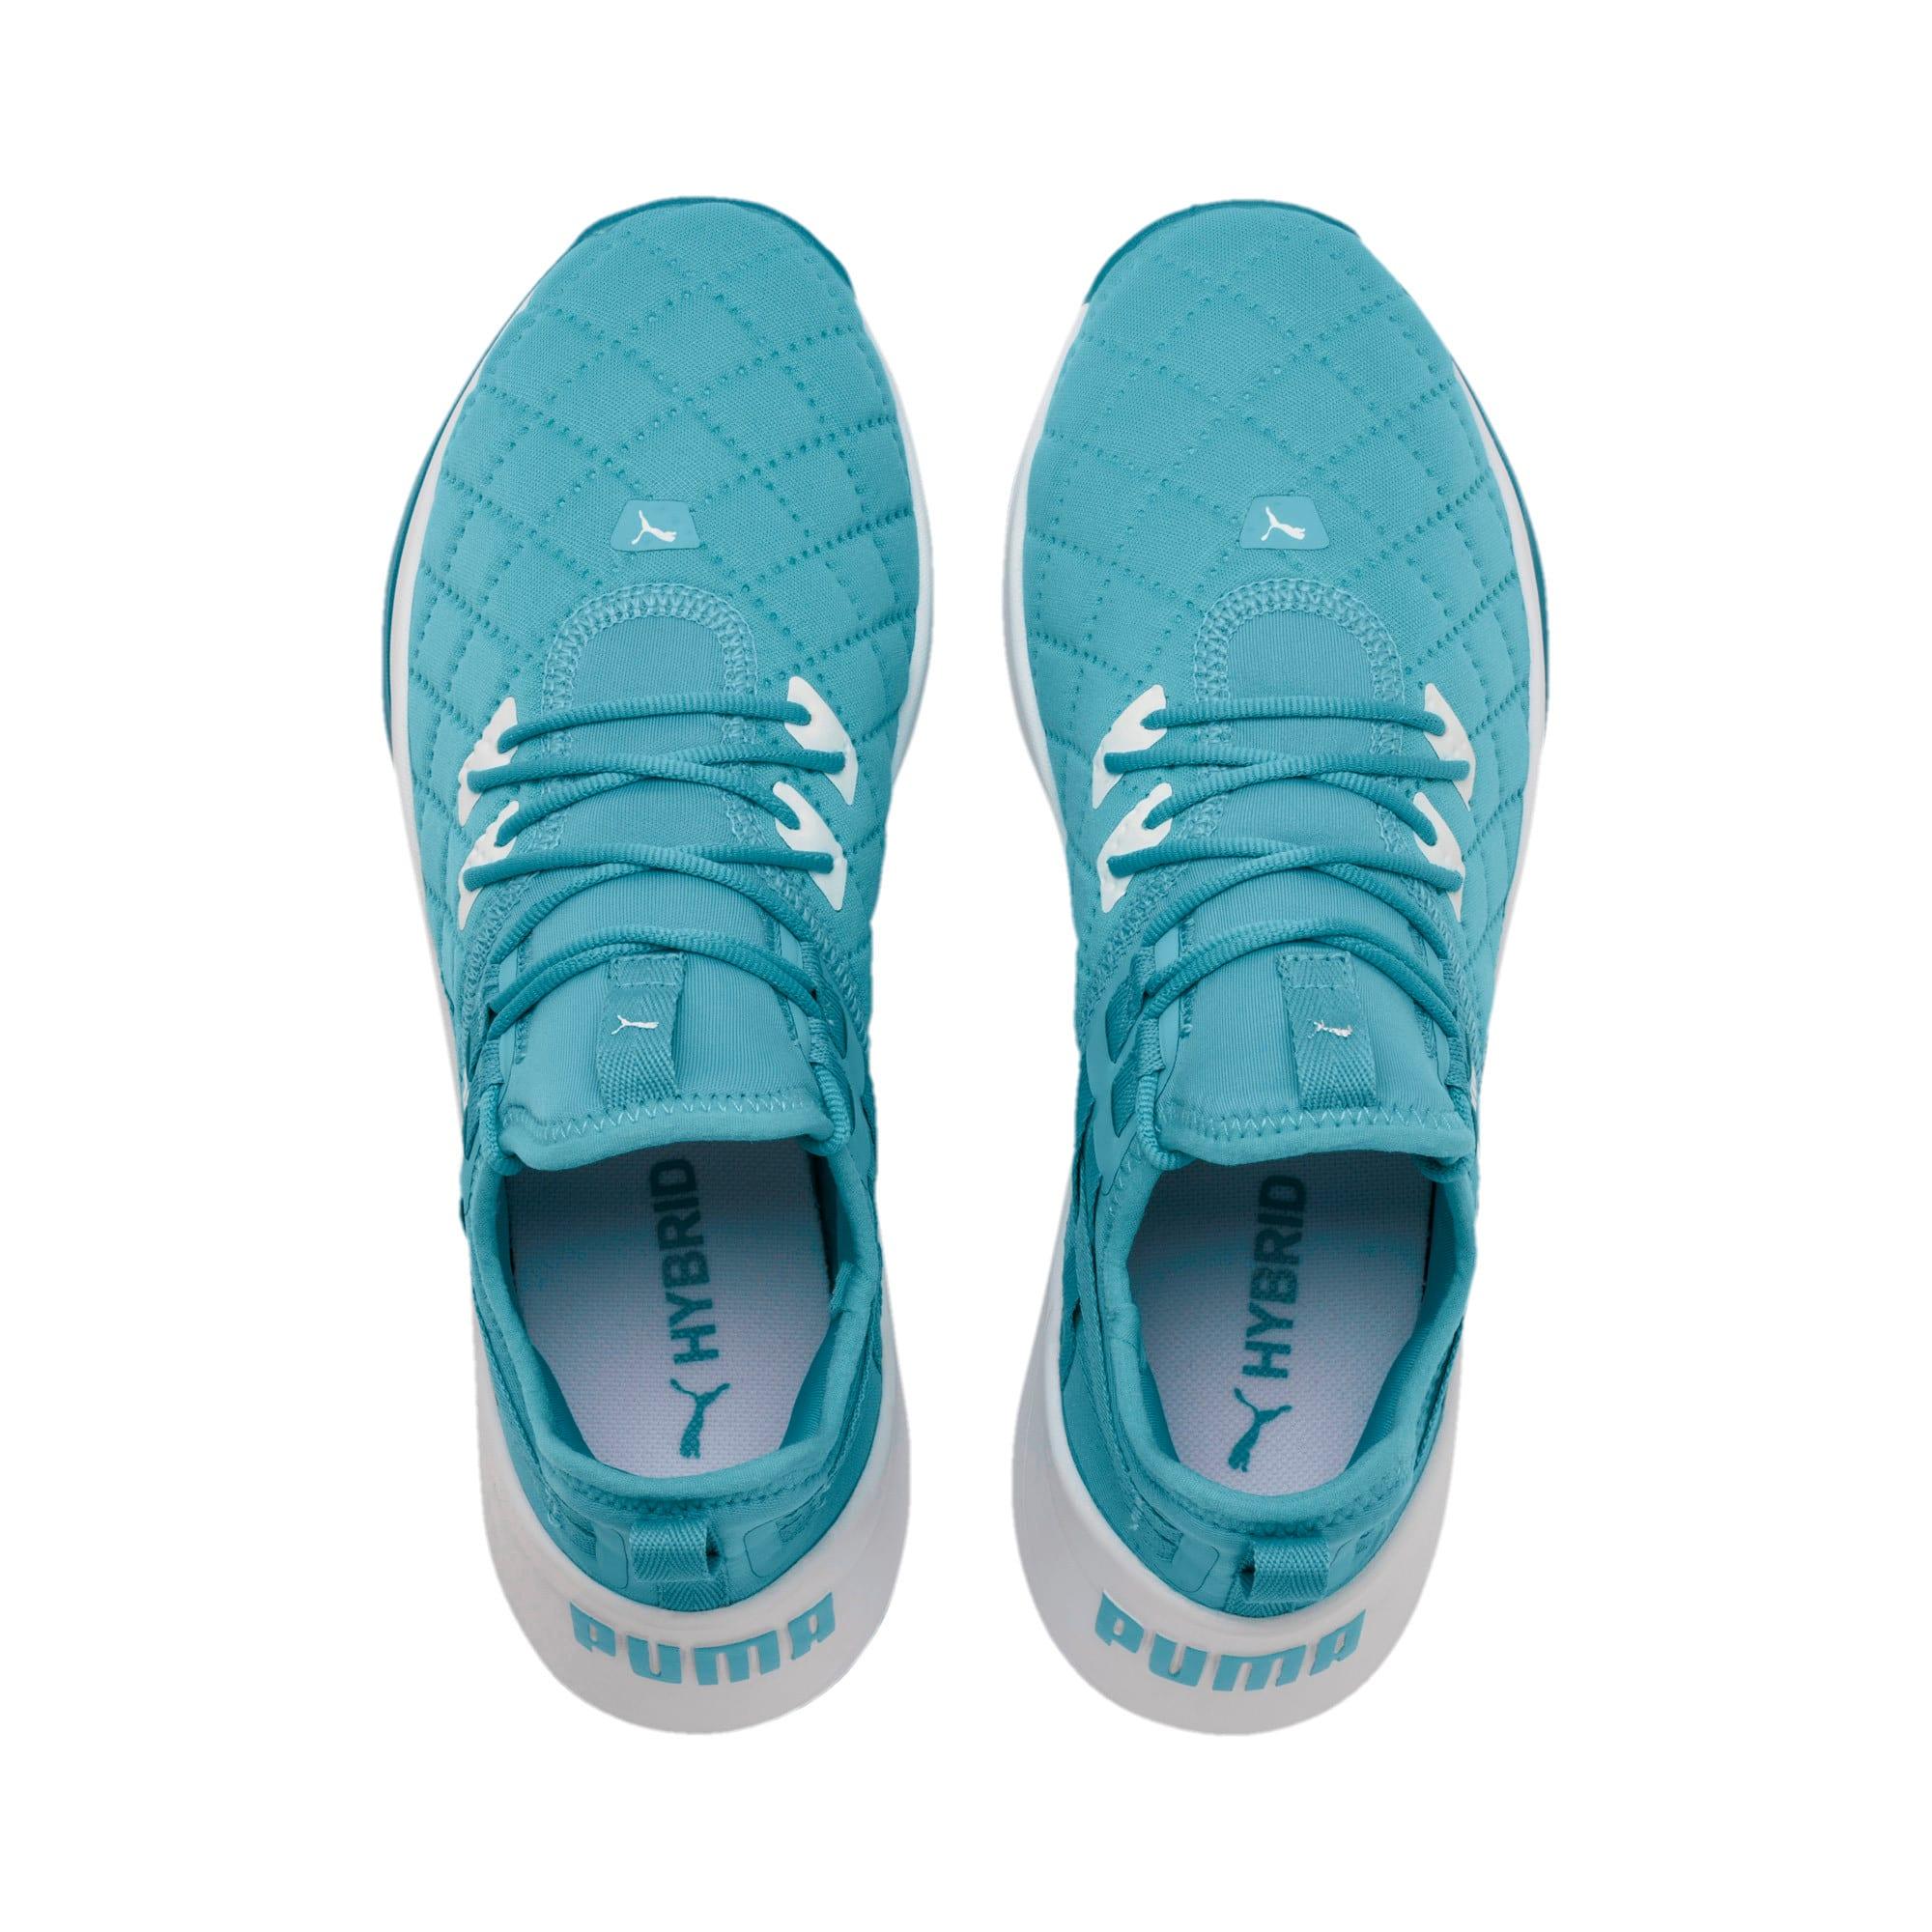 Thumbnail 7 of Jaab XT Quilt Women's Training Shoes, Milky Blue-Puma White, medium